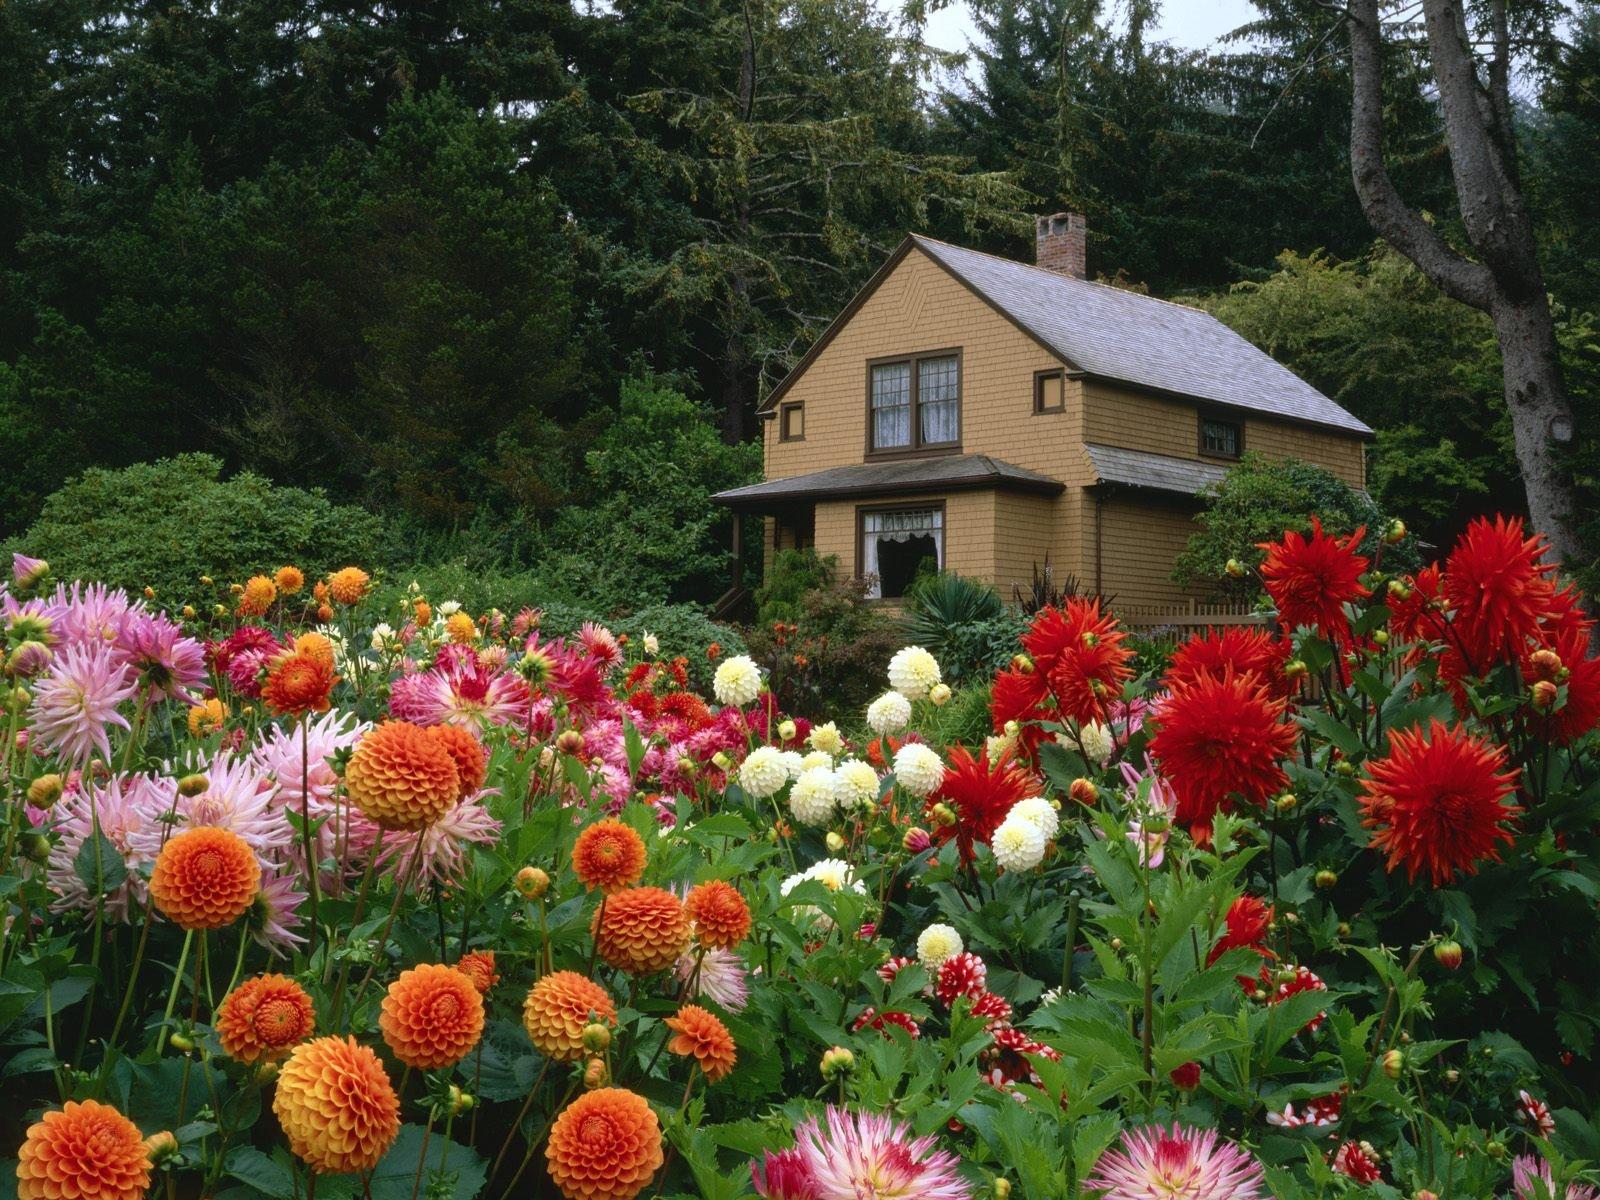 Garden House Oregon Wallpapers HD Wallpapers 1600x1200